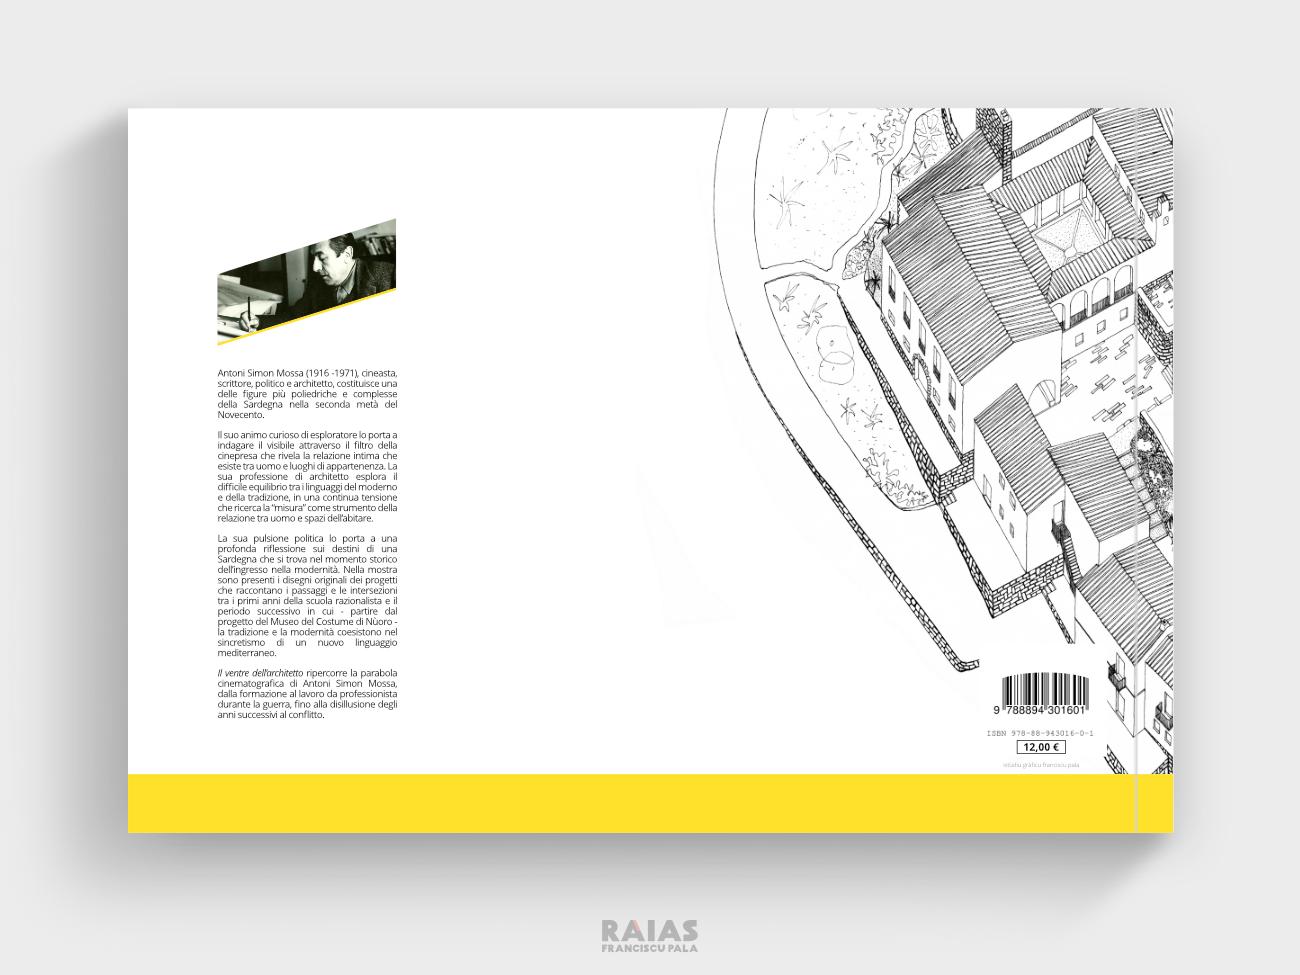 Quarta di copertina del catalogo della mostra